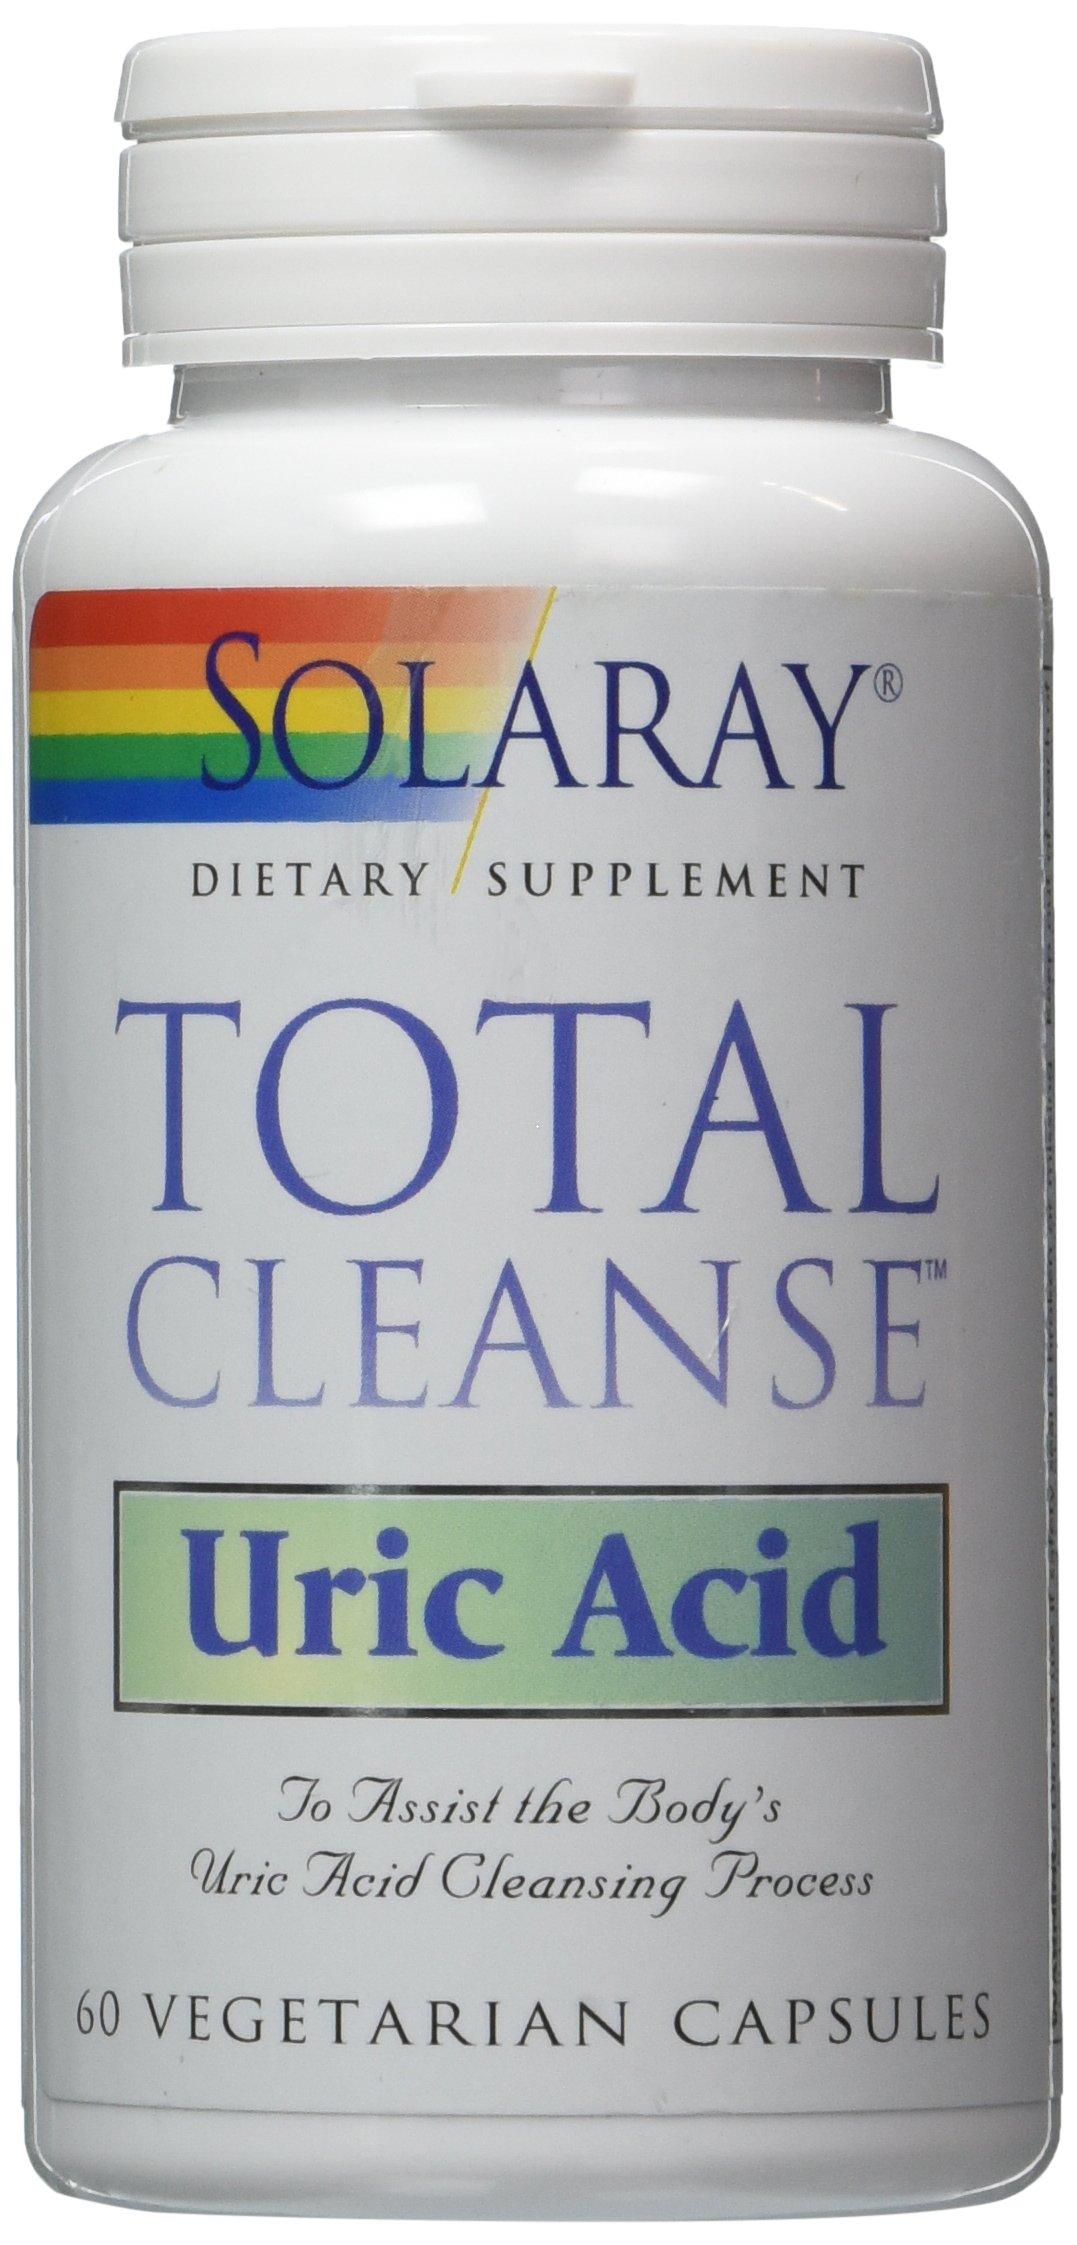 SOLARAY TOTAL CLEANSE URIC ACID 60 Vegetarian Capsules